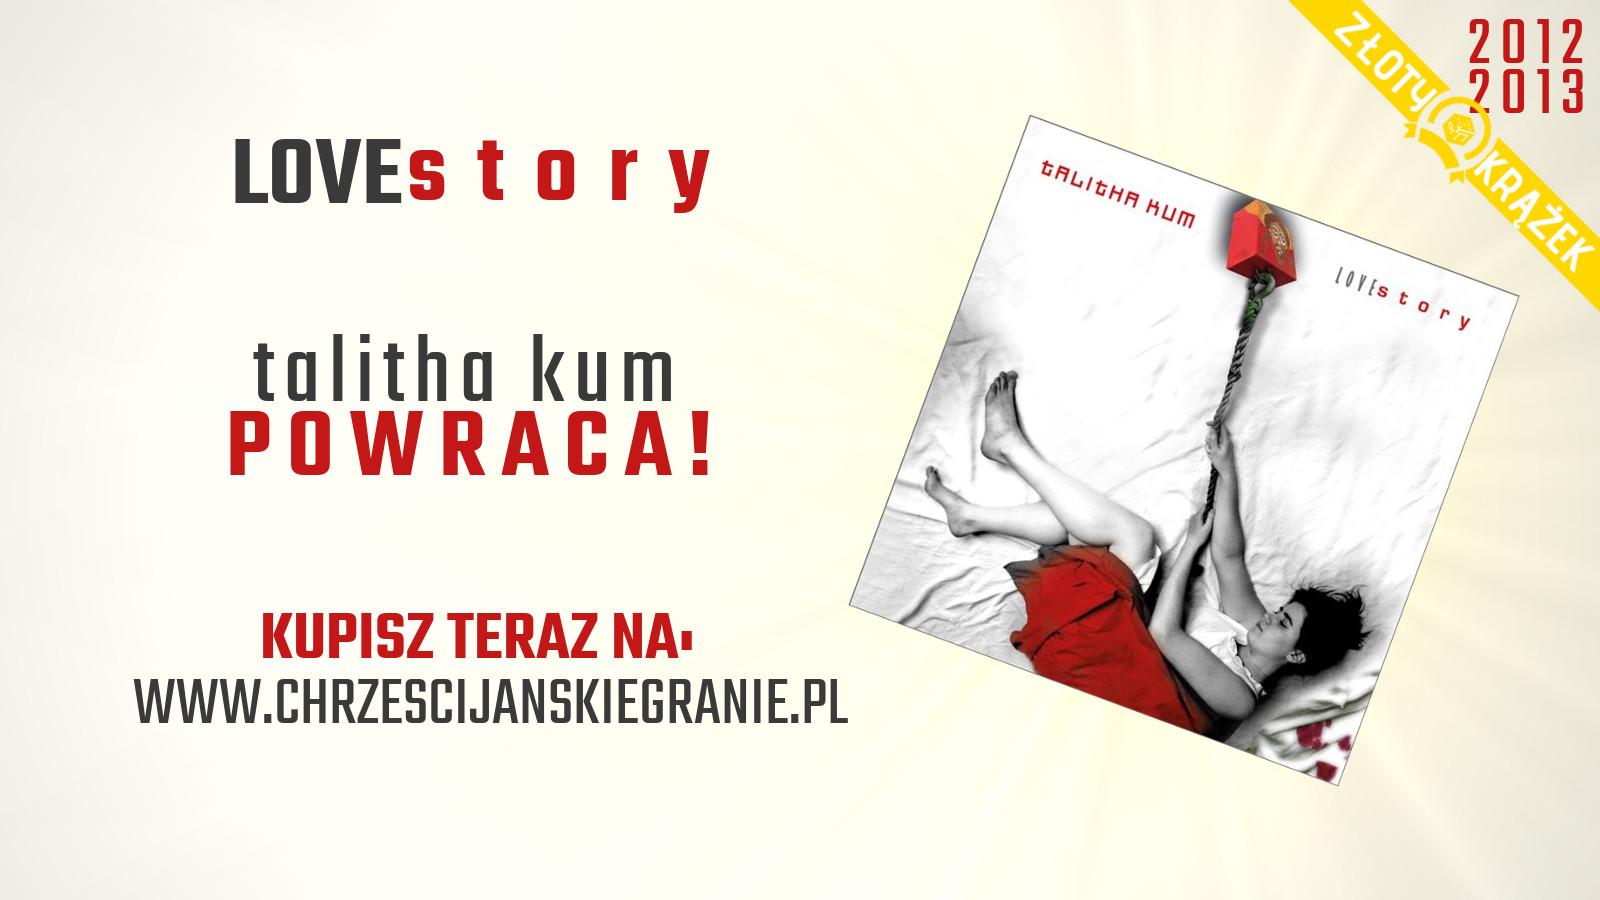 Love Story - Talitha kum